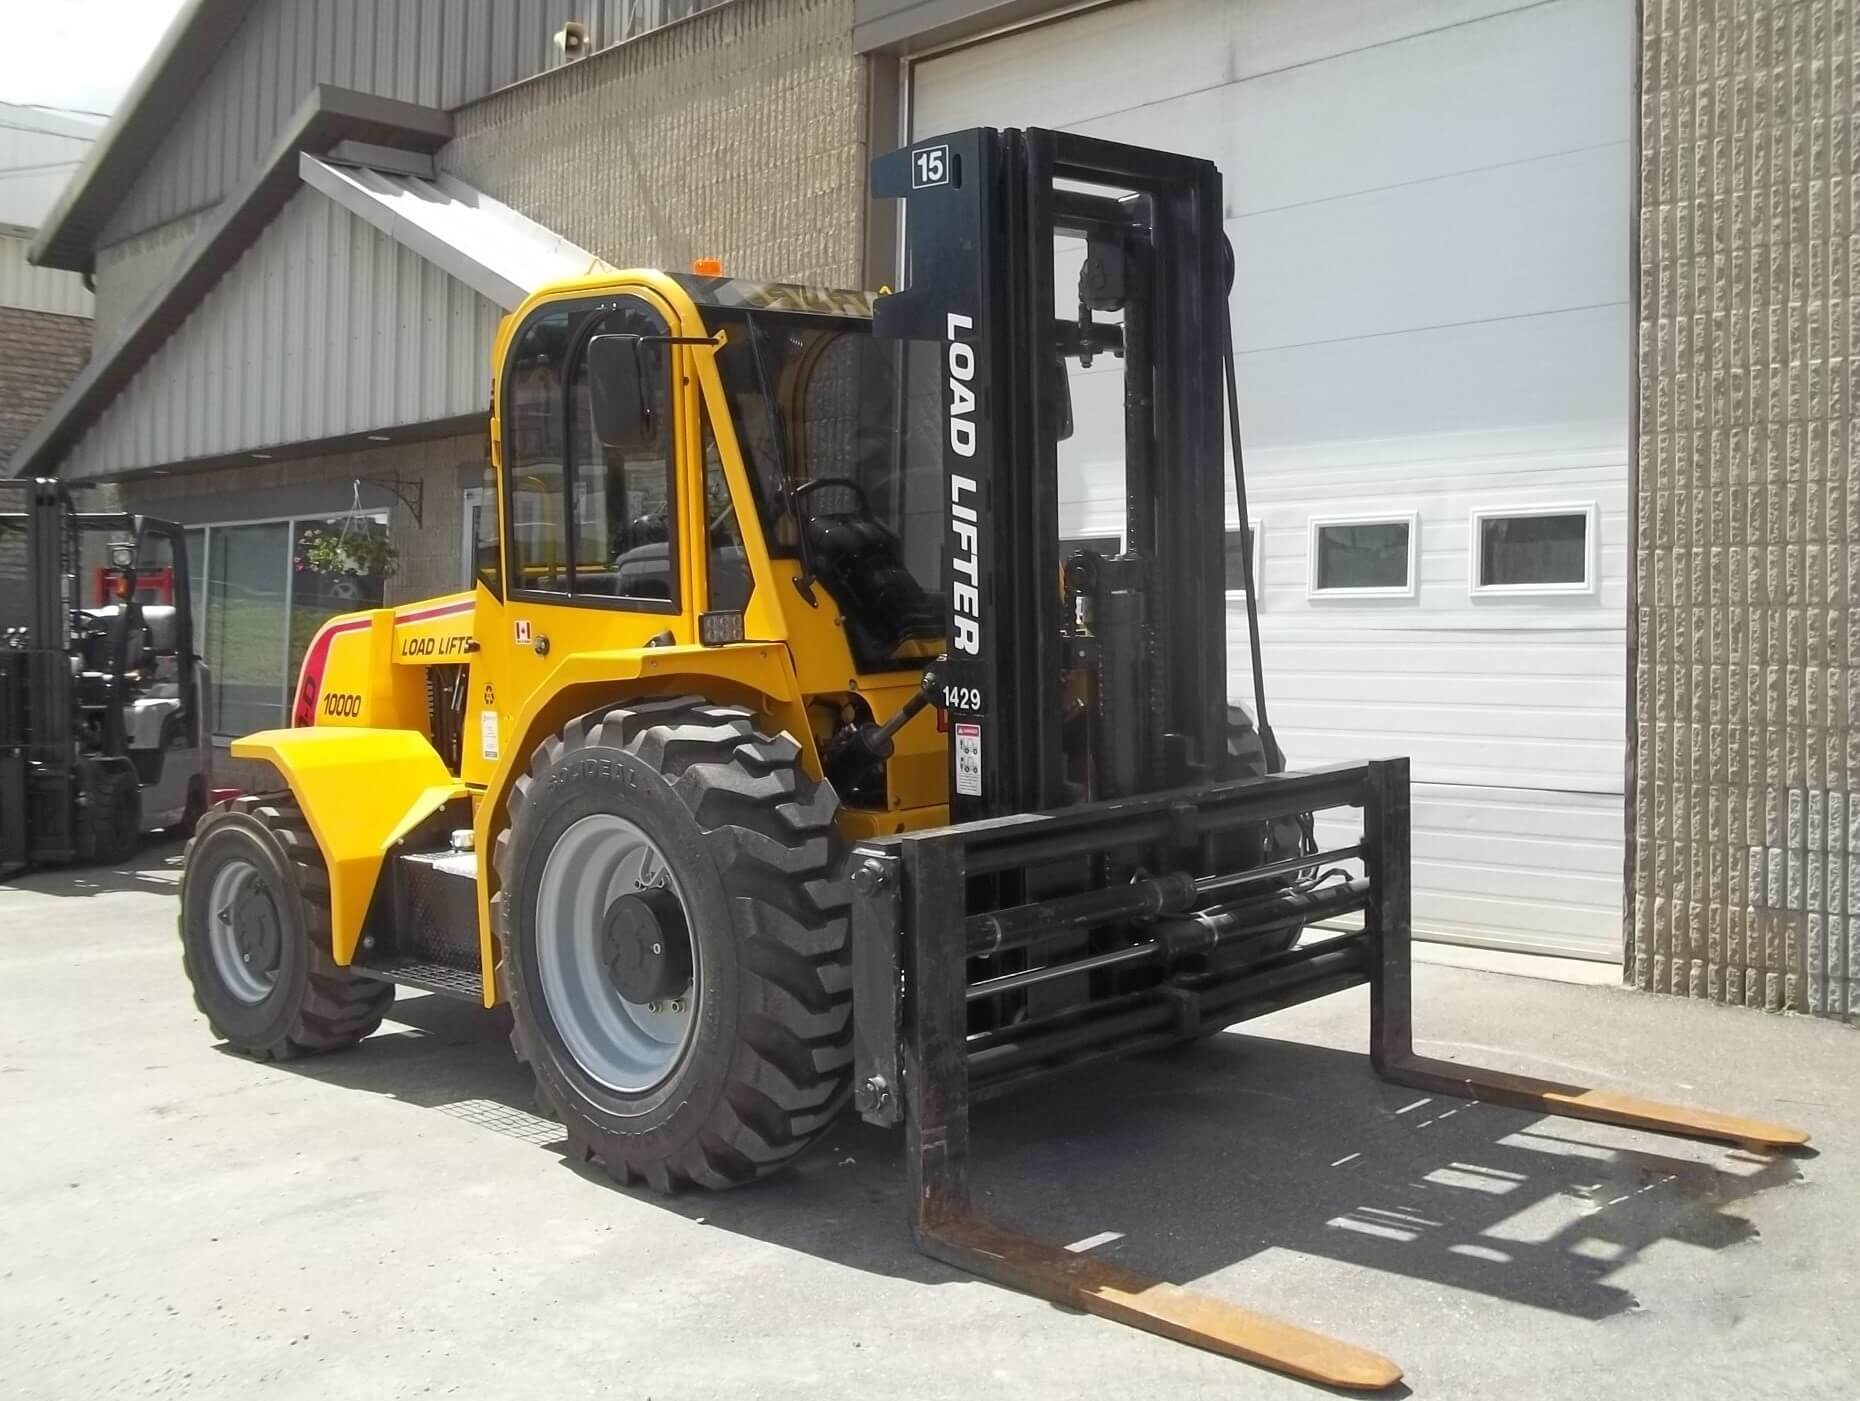 Load Lifter 2400 series forklift